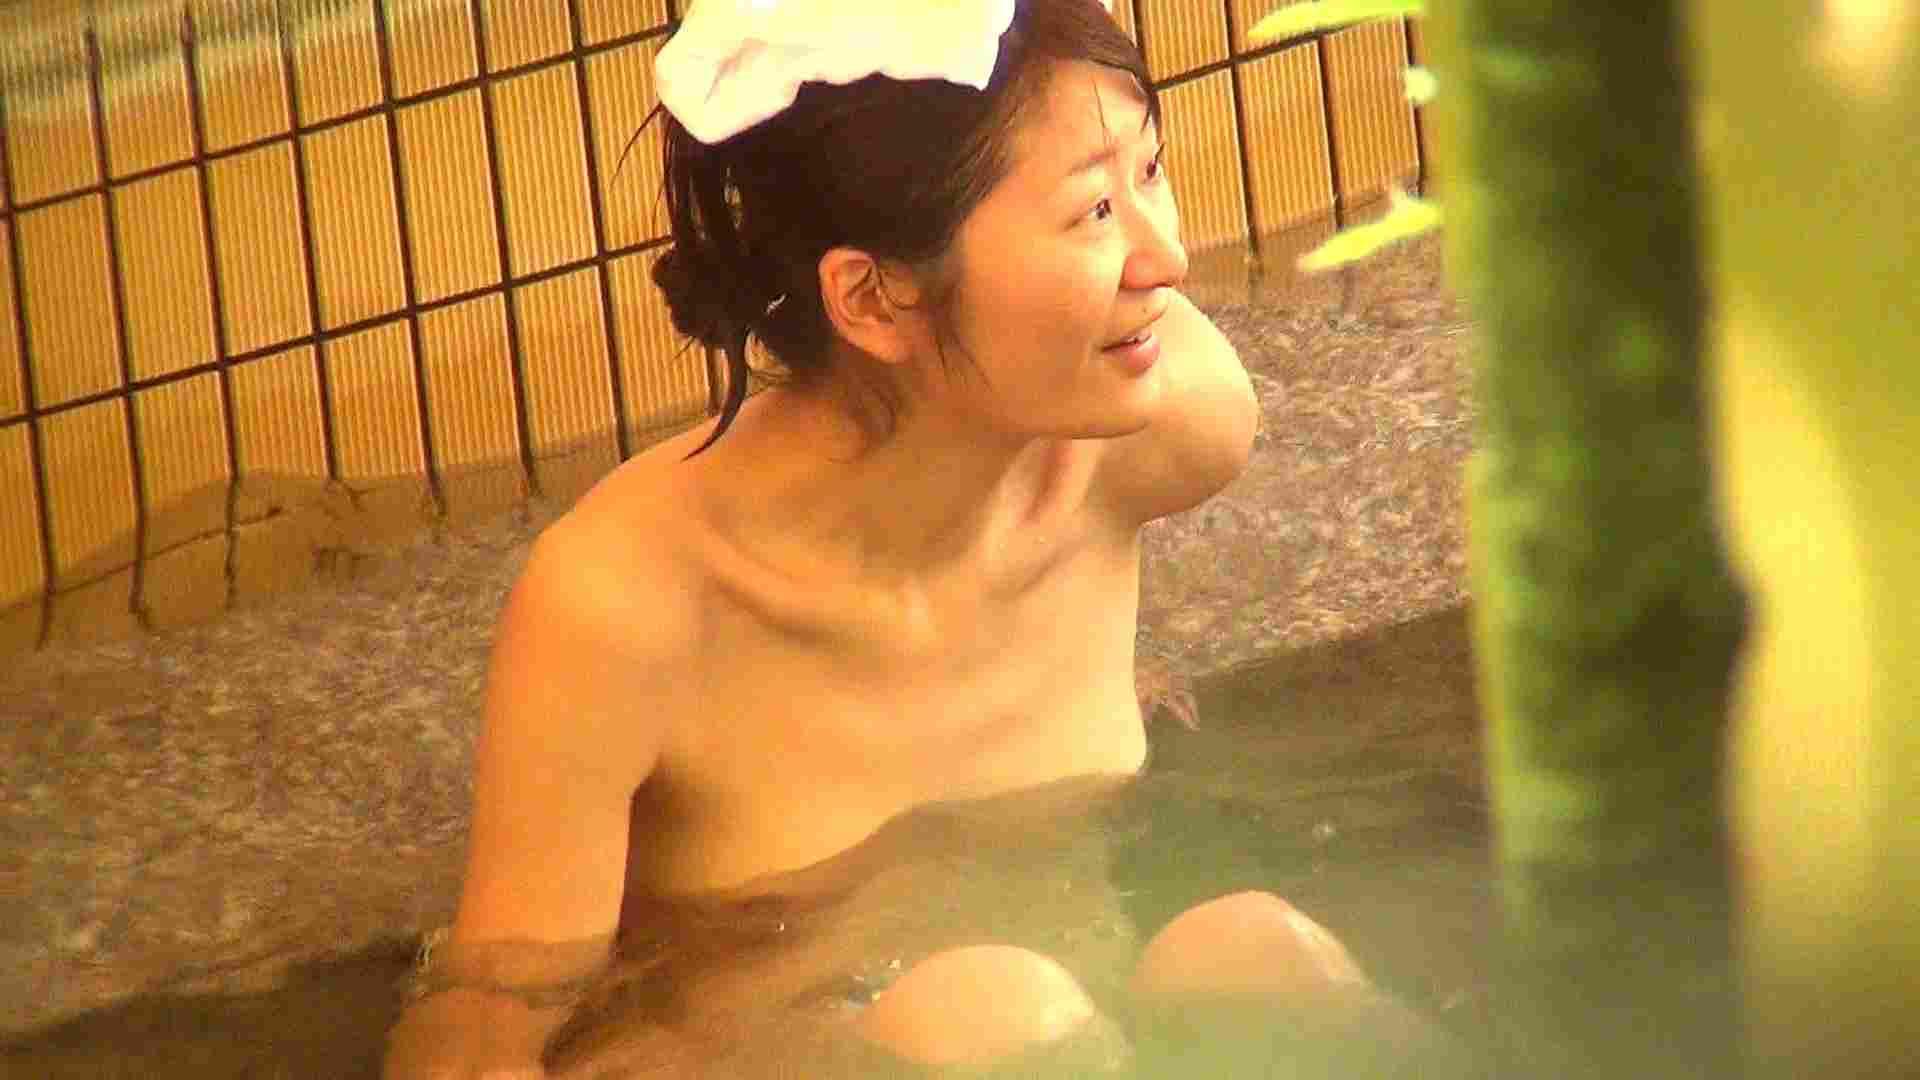 Aquaな露天風呂Vol.265 0   0  51連発 29